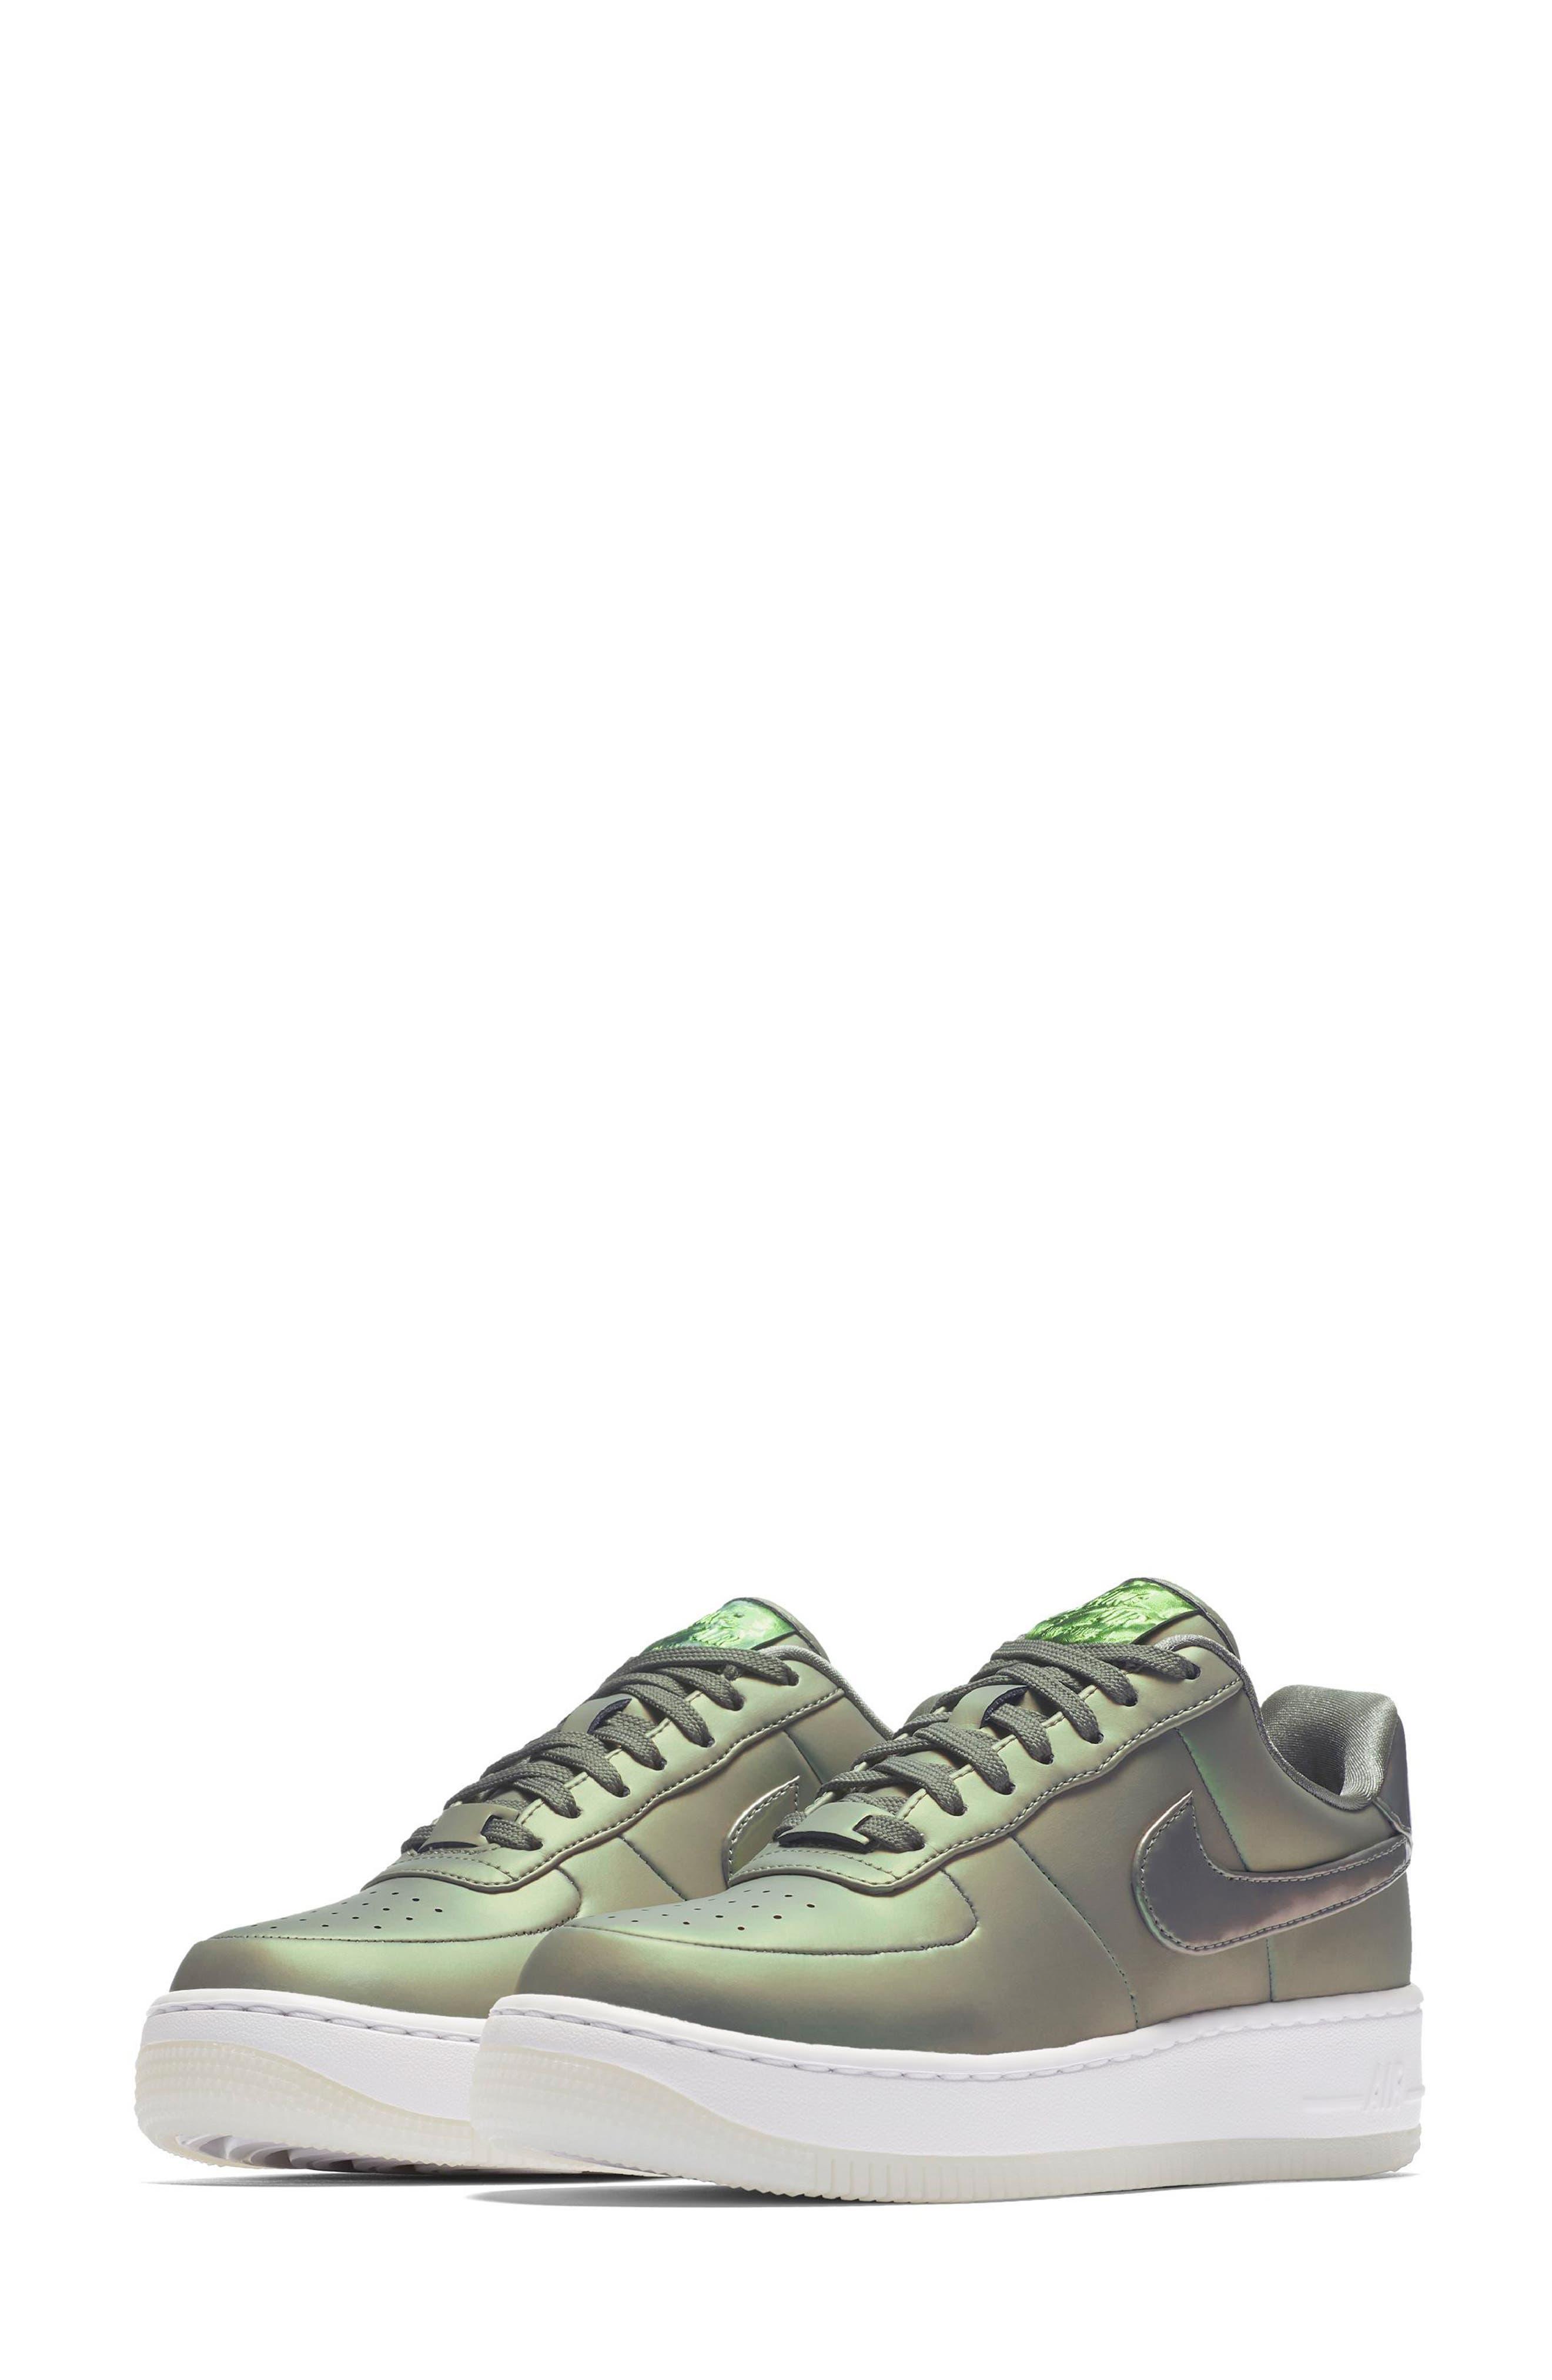 Air Force 1 Upstep Premium LX Shoe,                         Main,                         color, 252